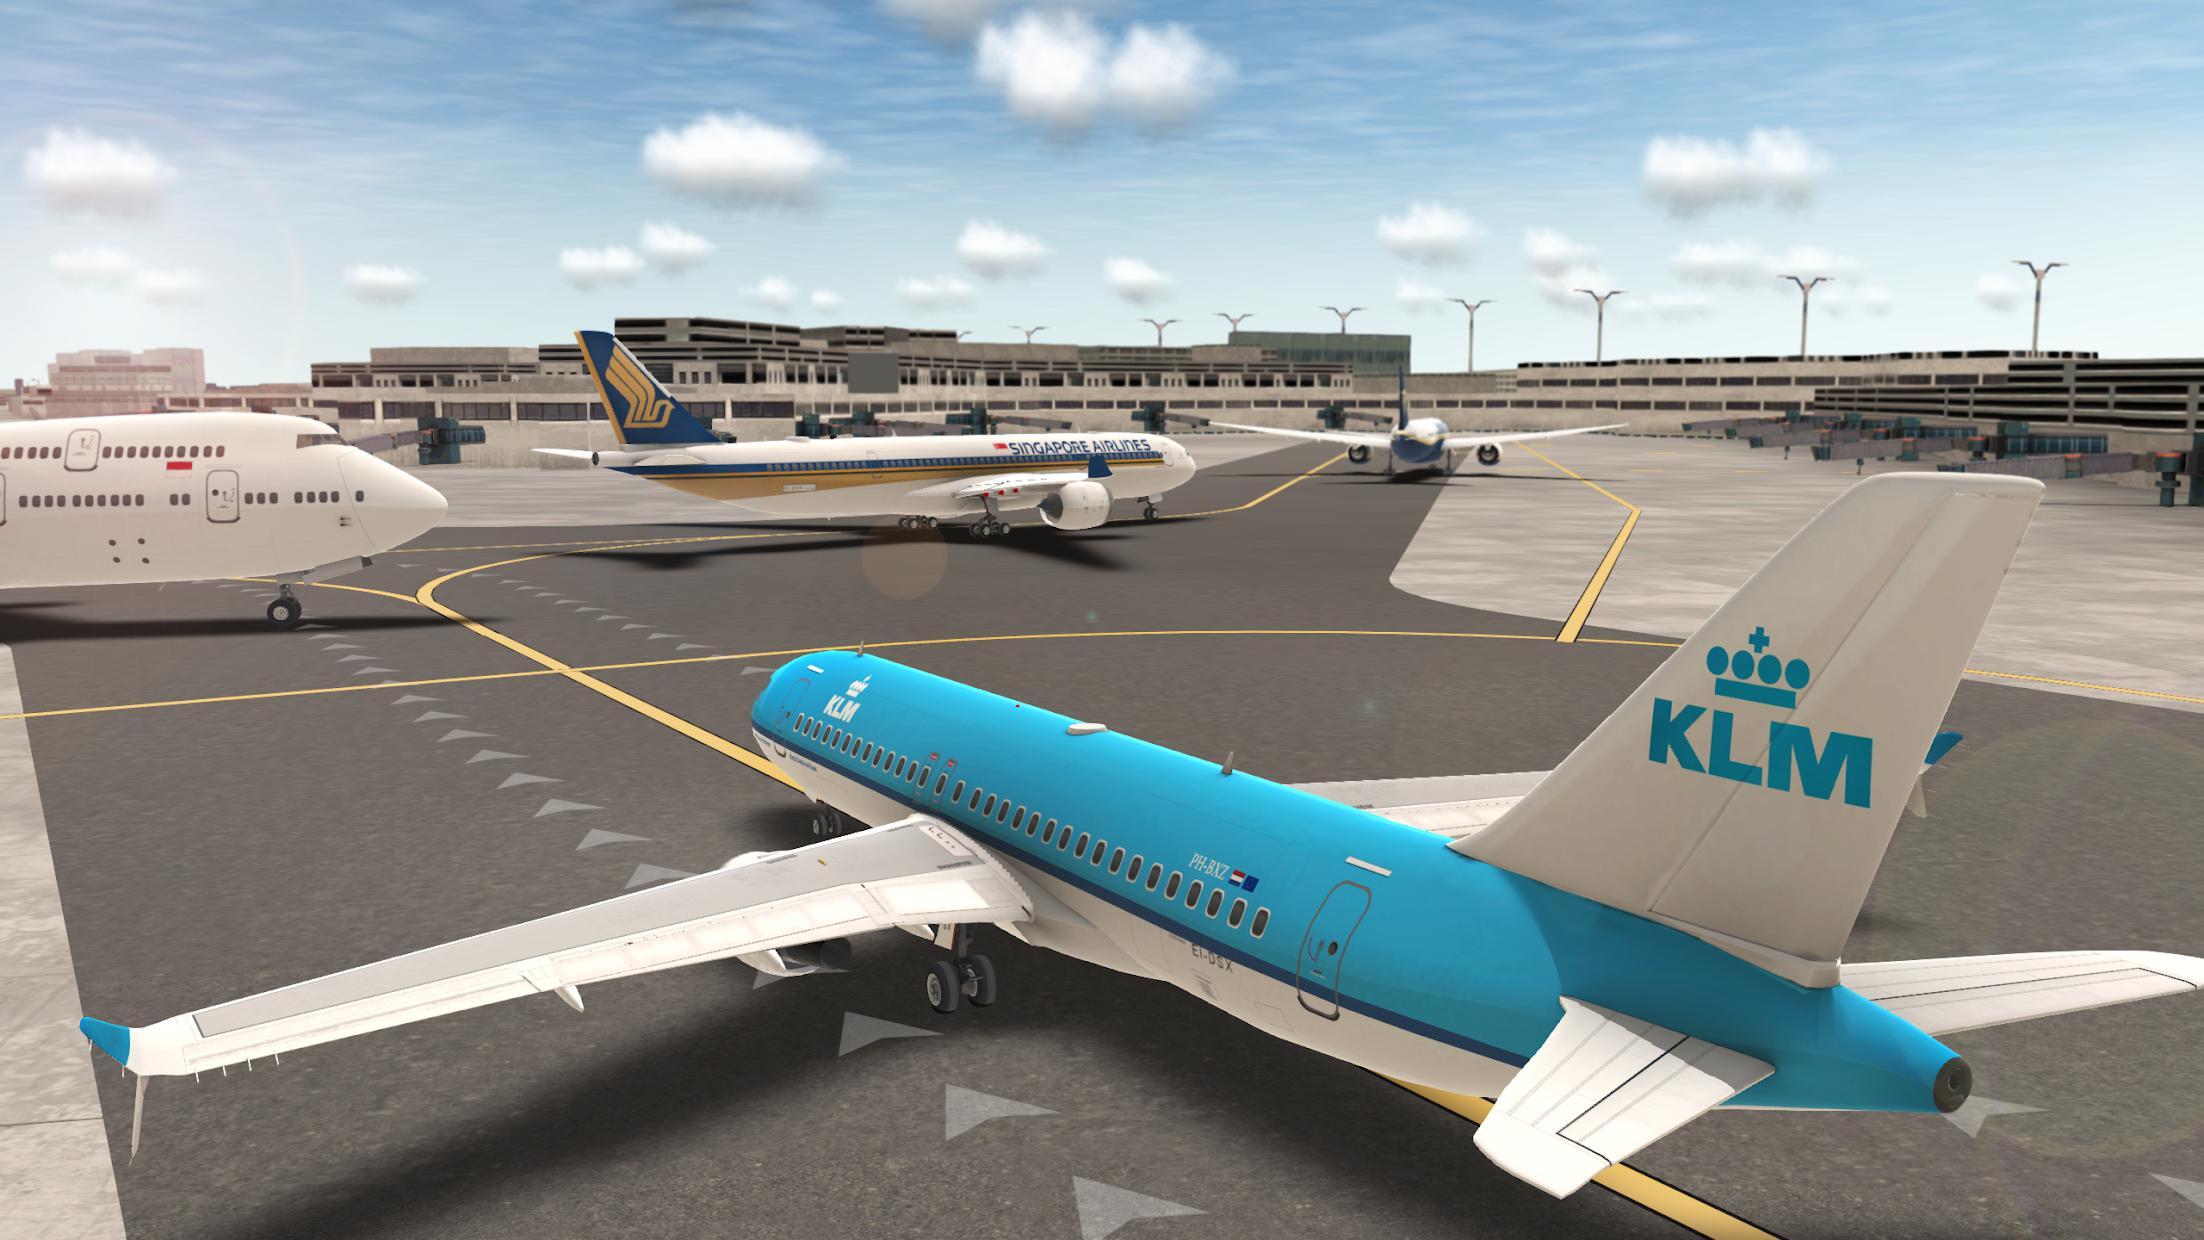 RFS - 真实飞行模拟 游戏截图3